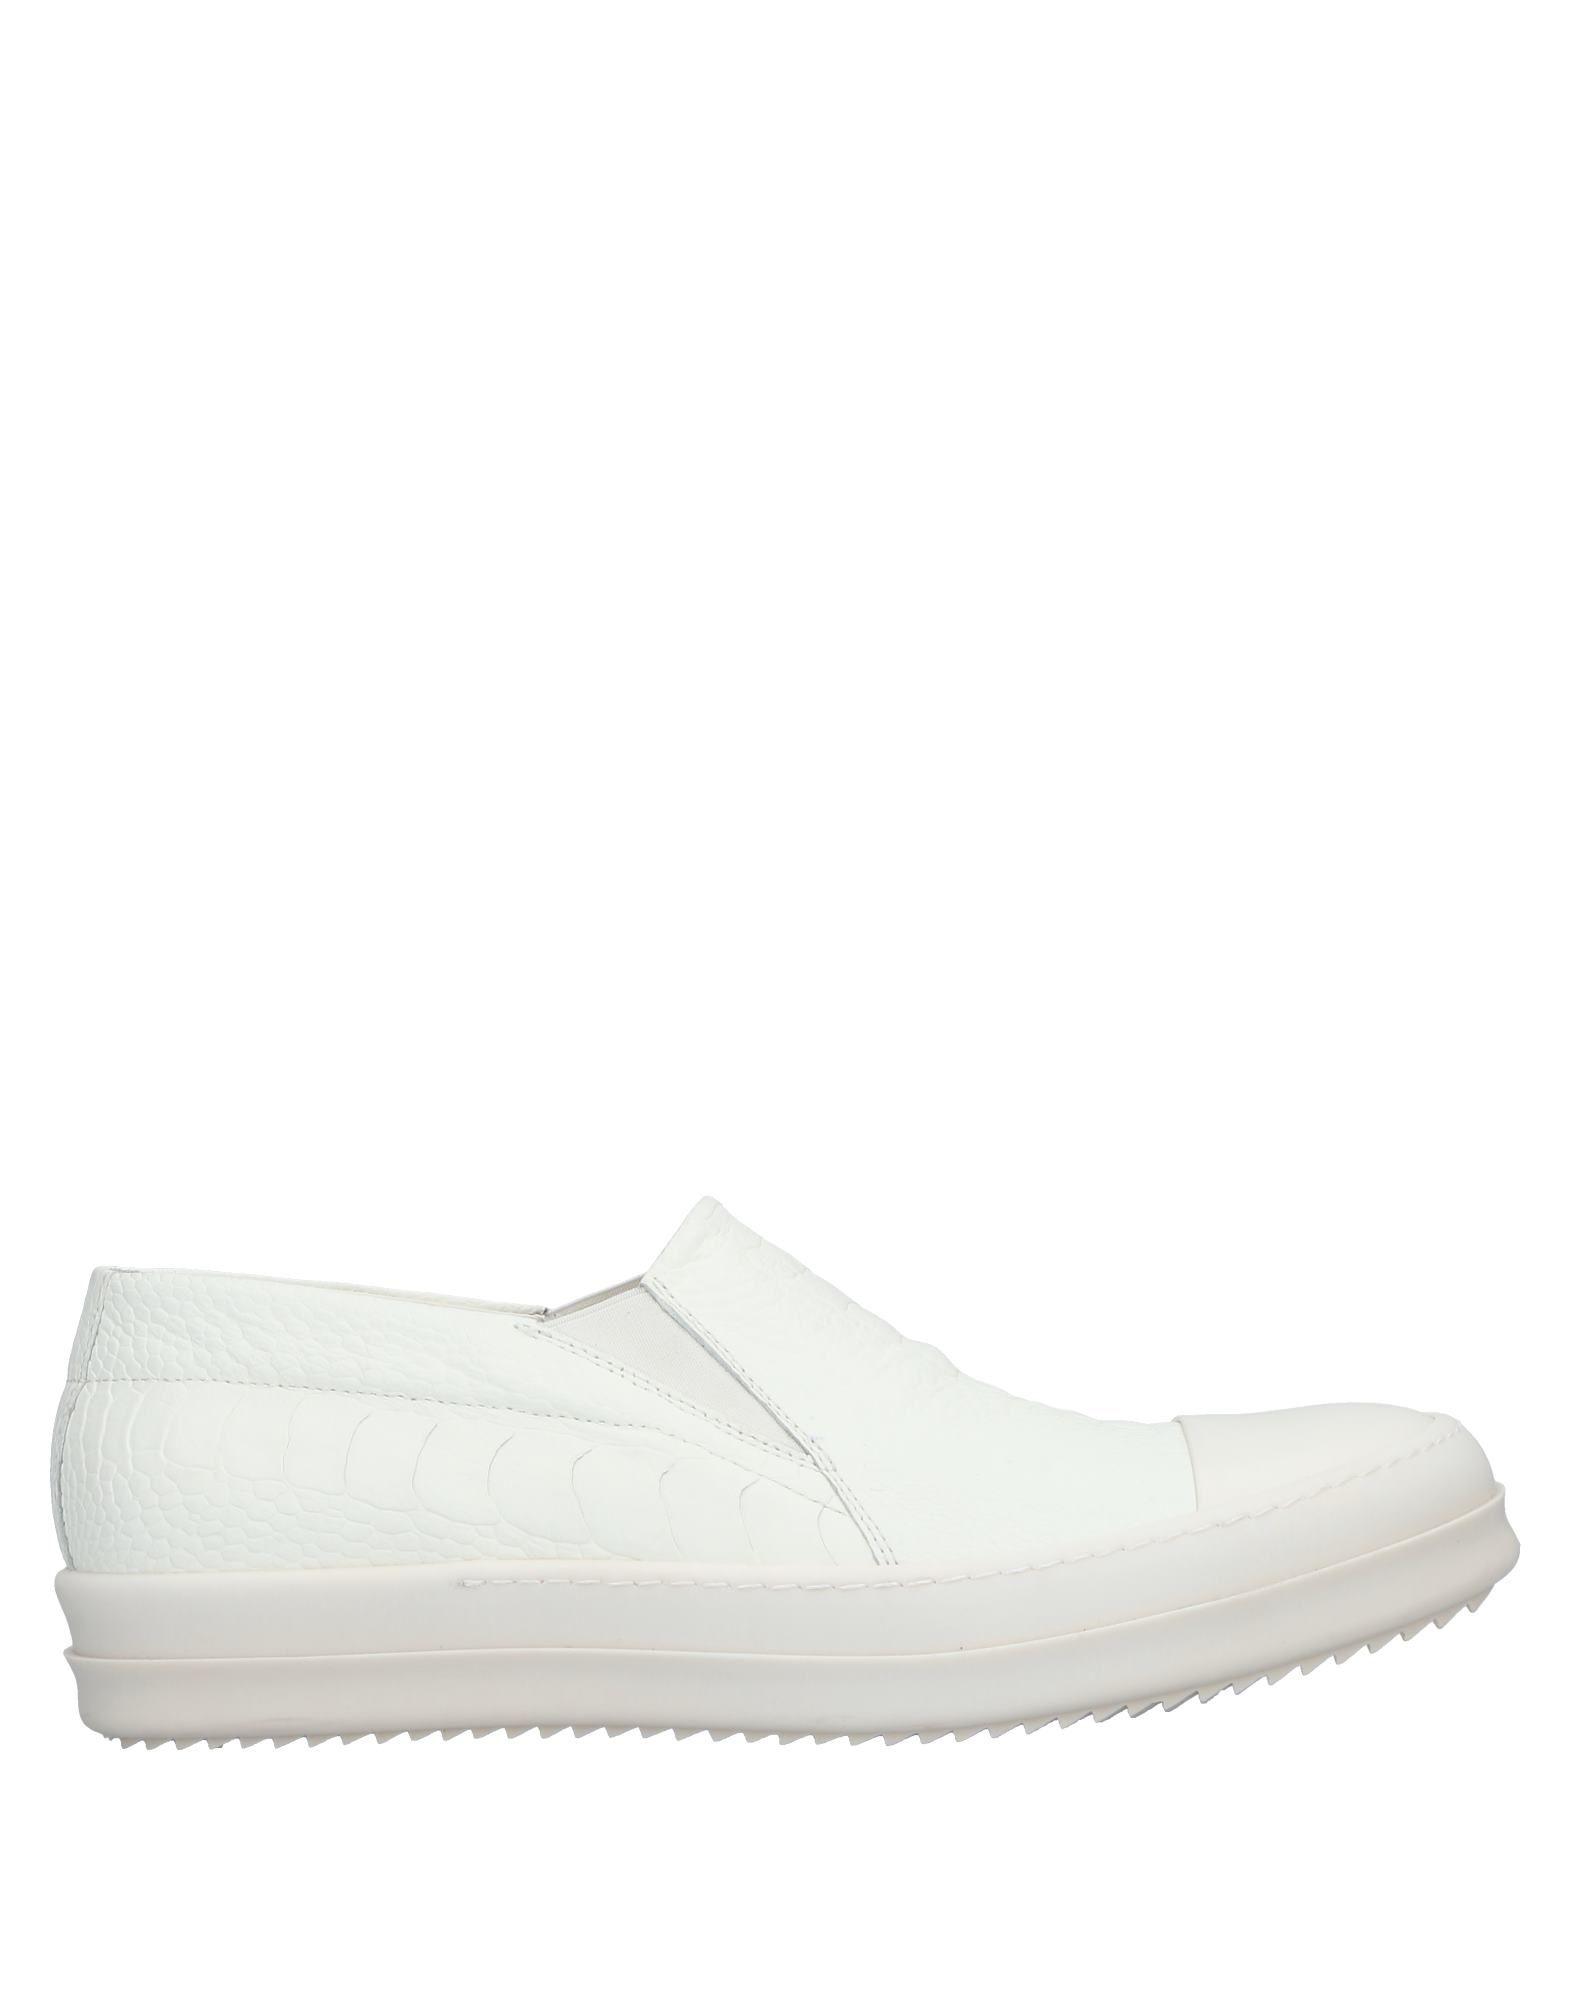 Rick Owens Sneakers Herren  11520868MM Gute Qualität beliebte Schuhe